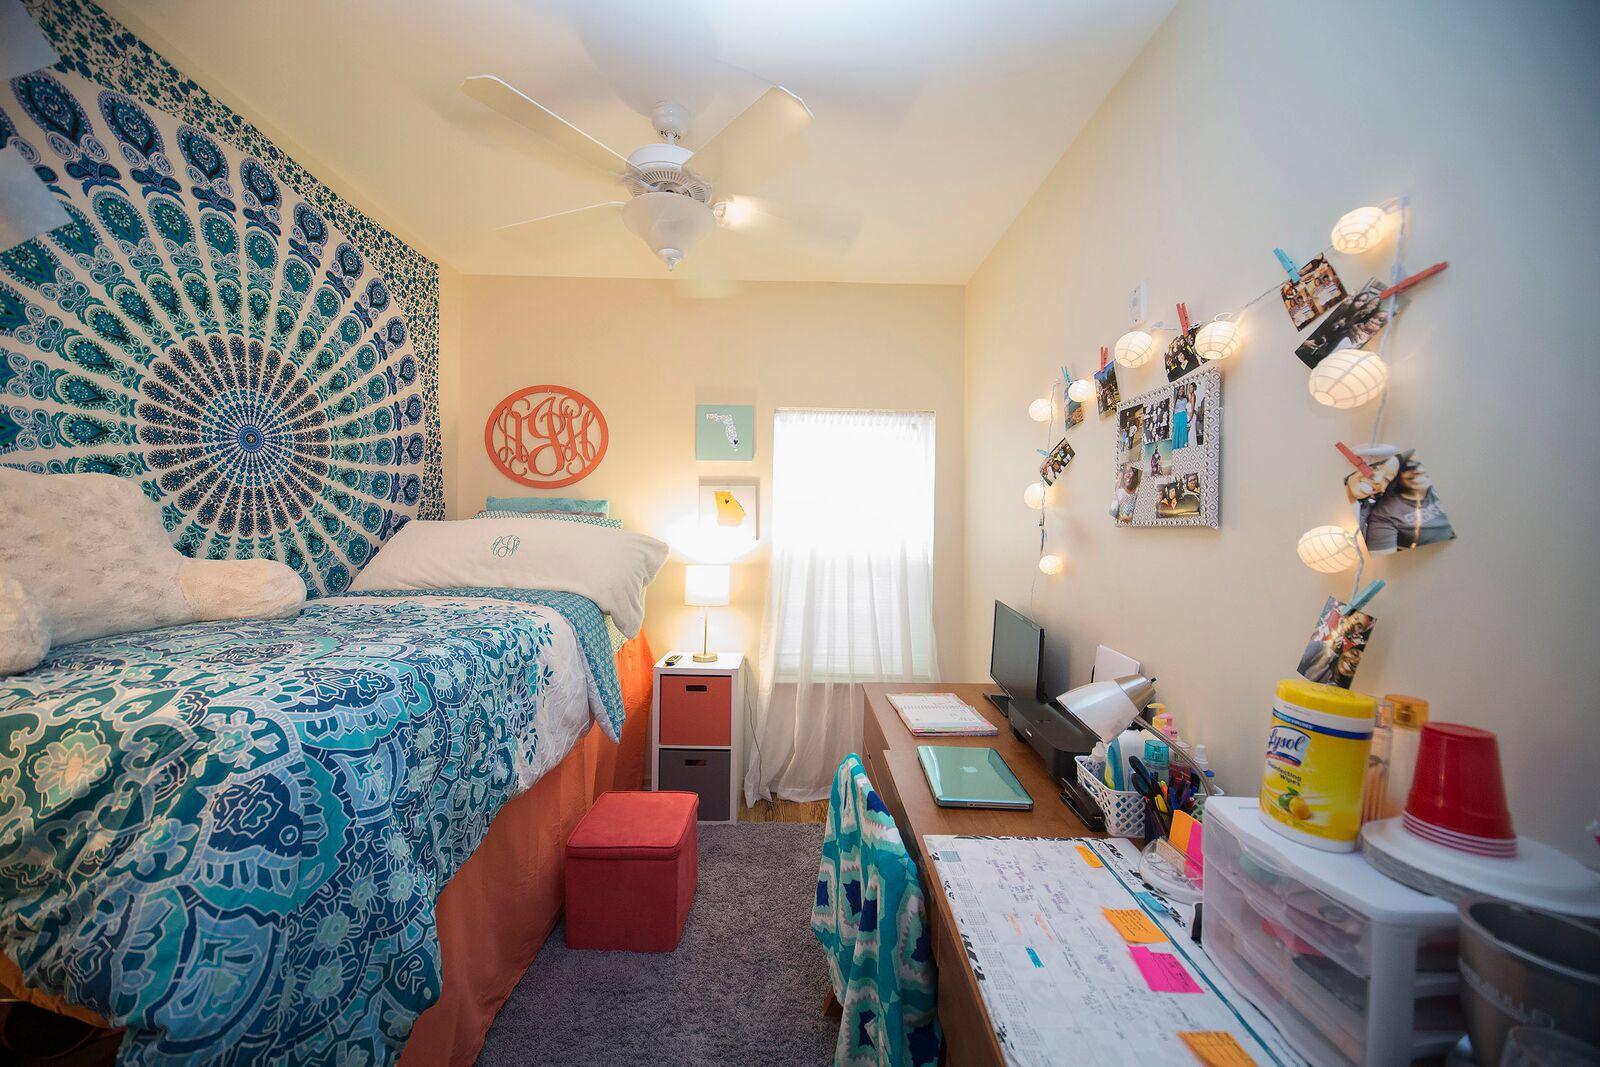 Diy College Tapestry